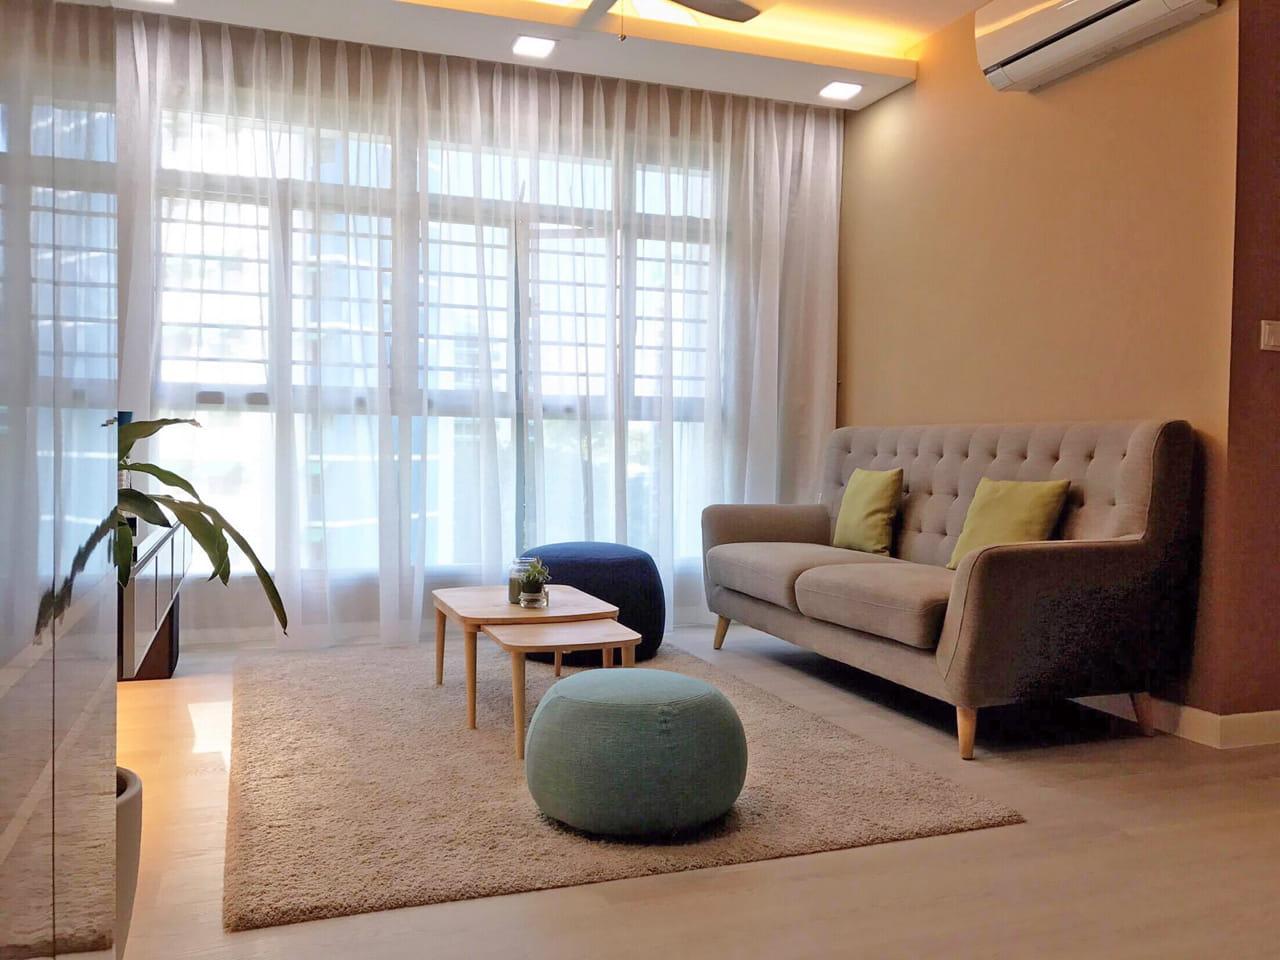 Signature Piece as The Living Room Focus - Comfort Furniture